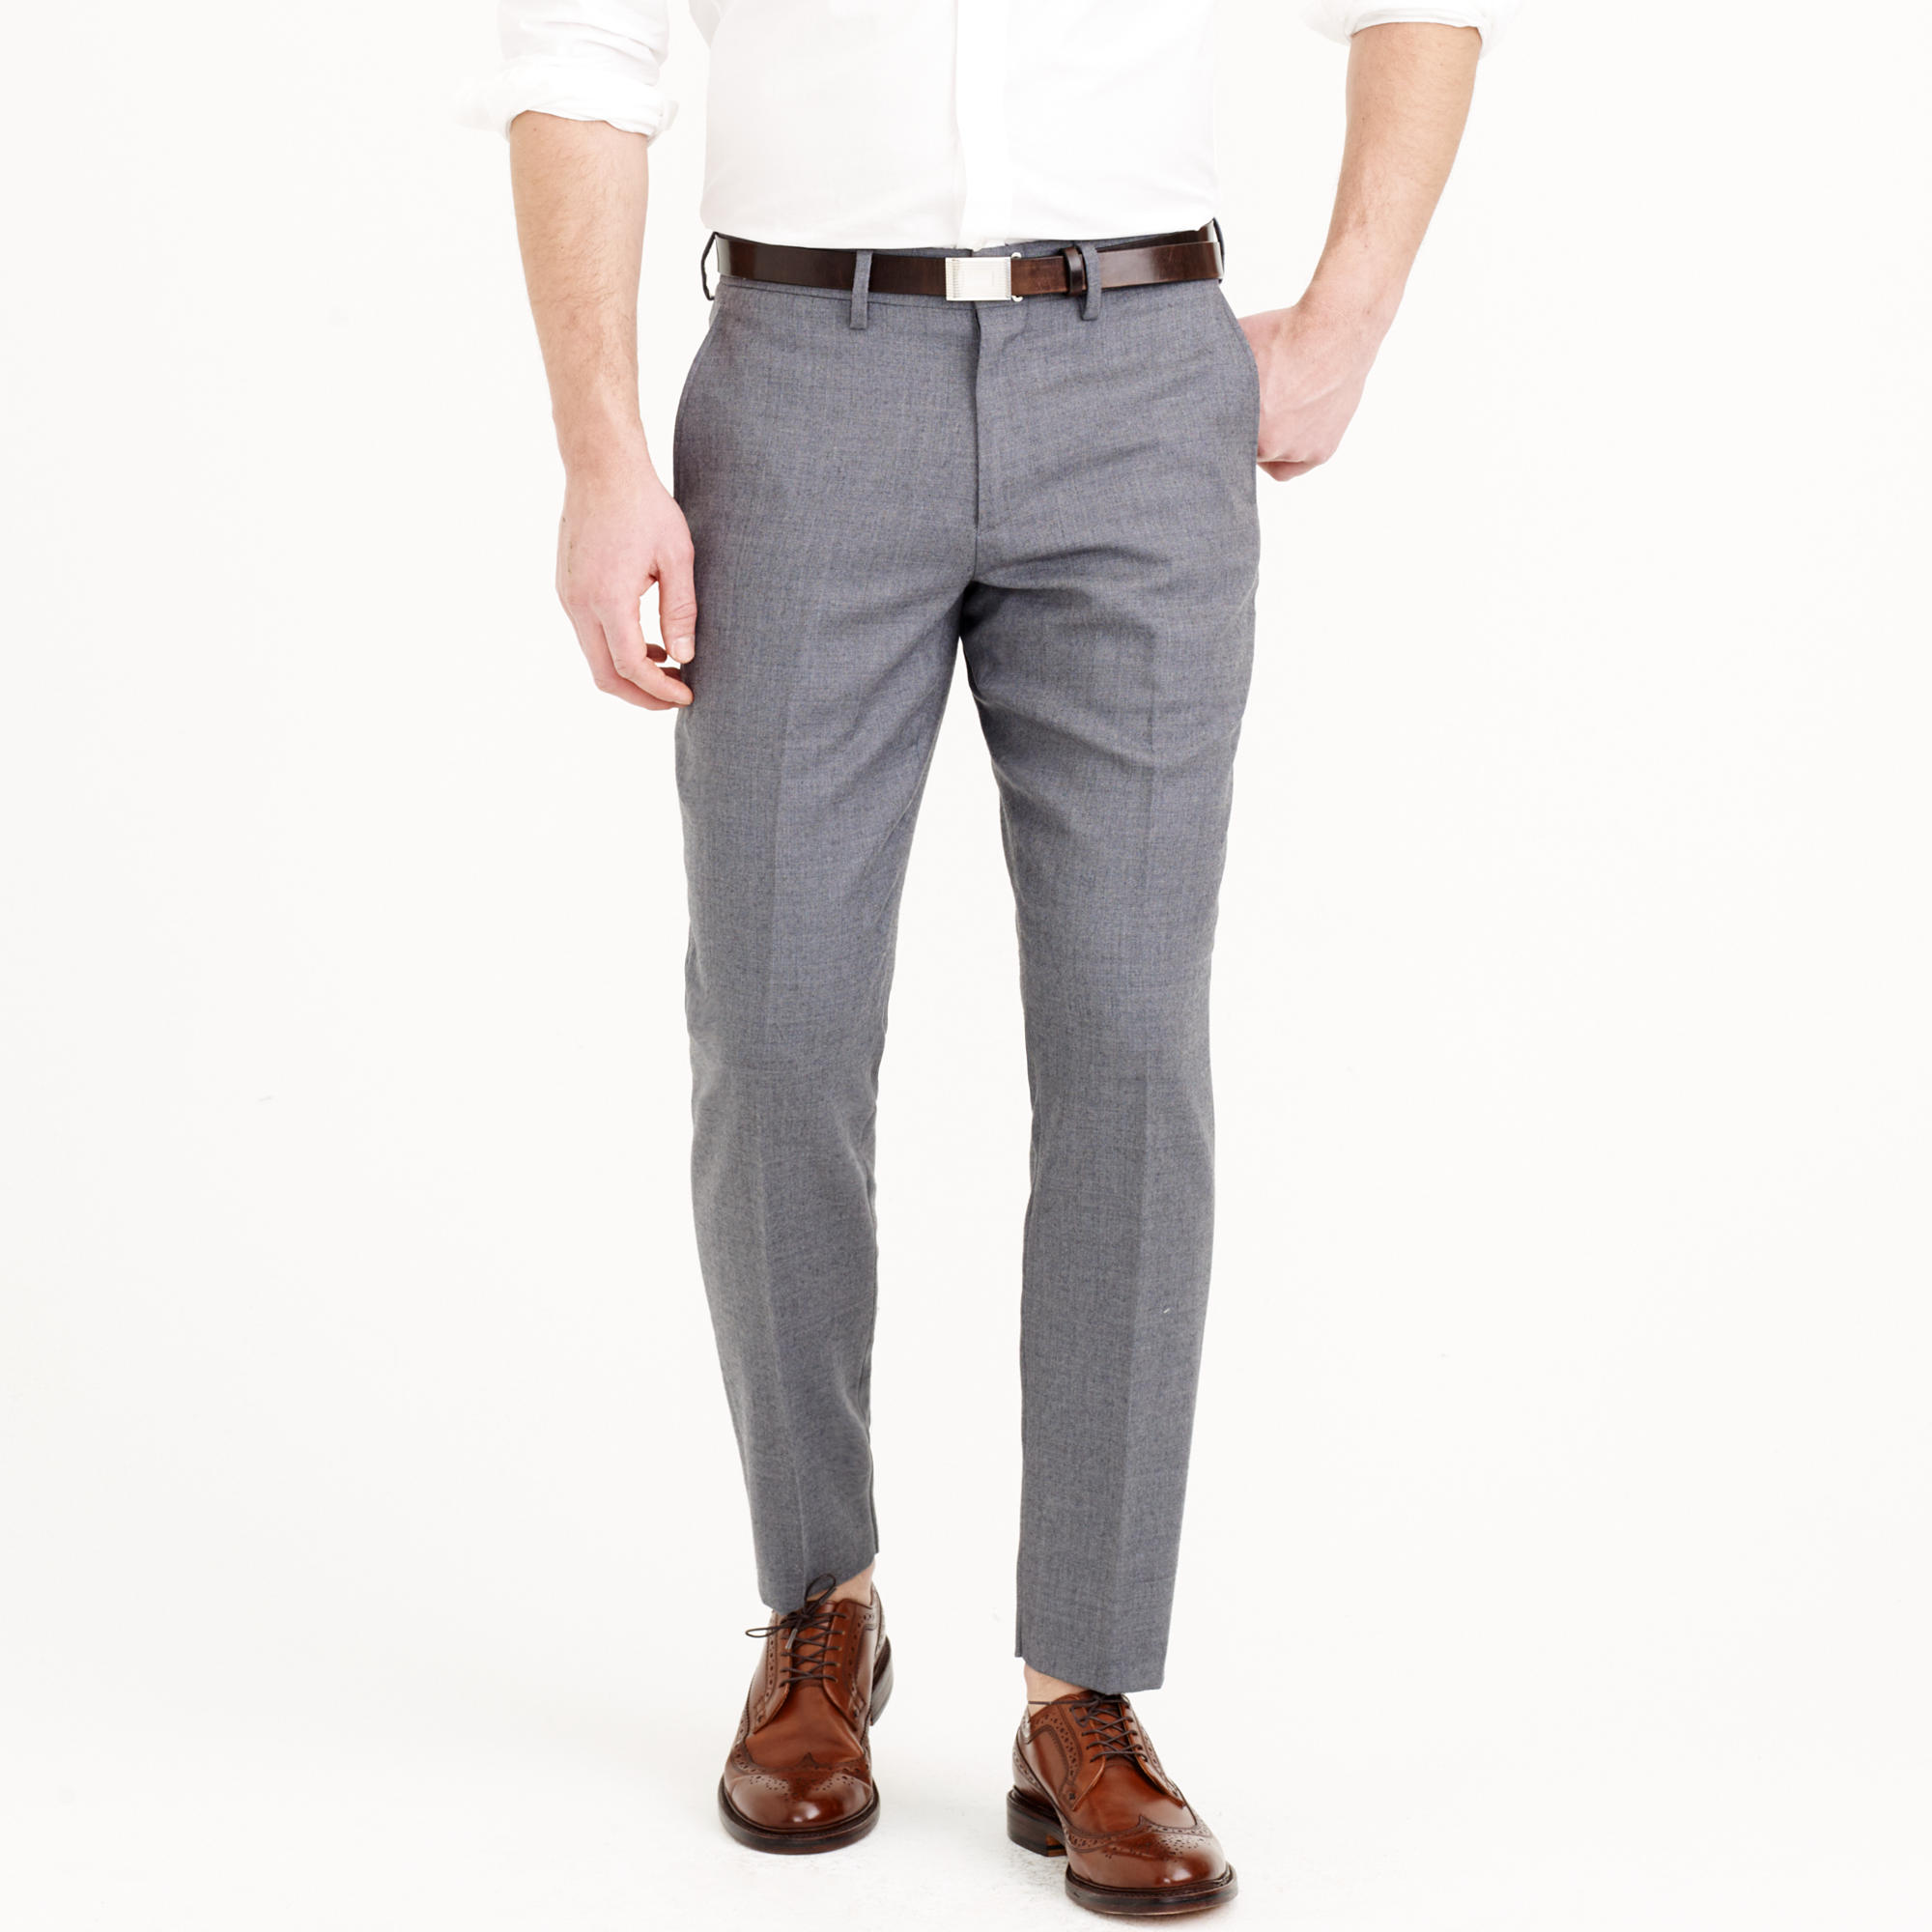 Unique Grey Sweater Brown Pants White Shoes  Style  Pinterest